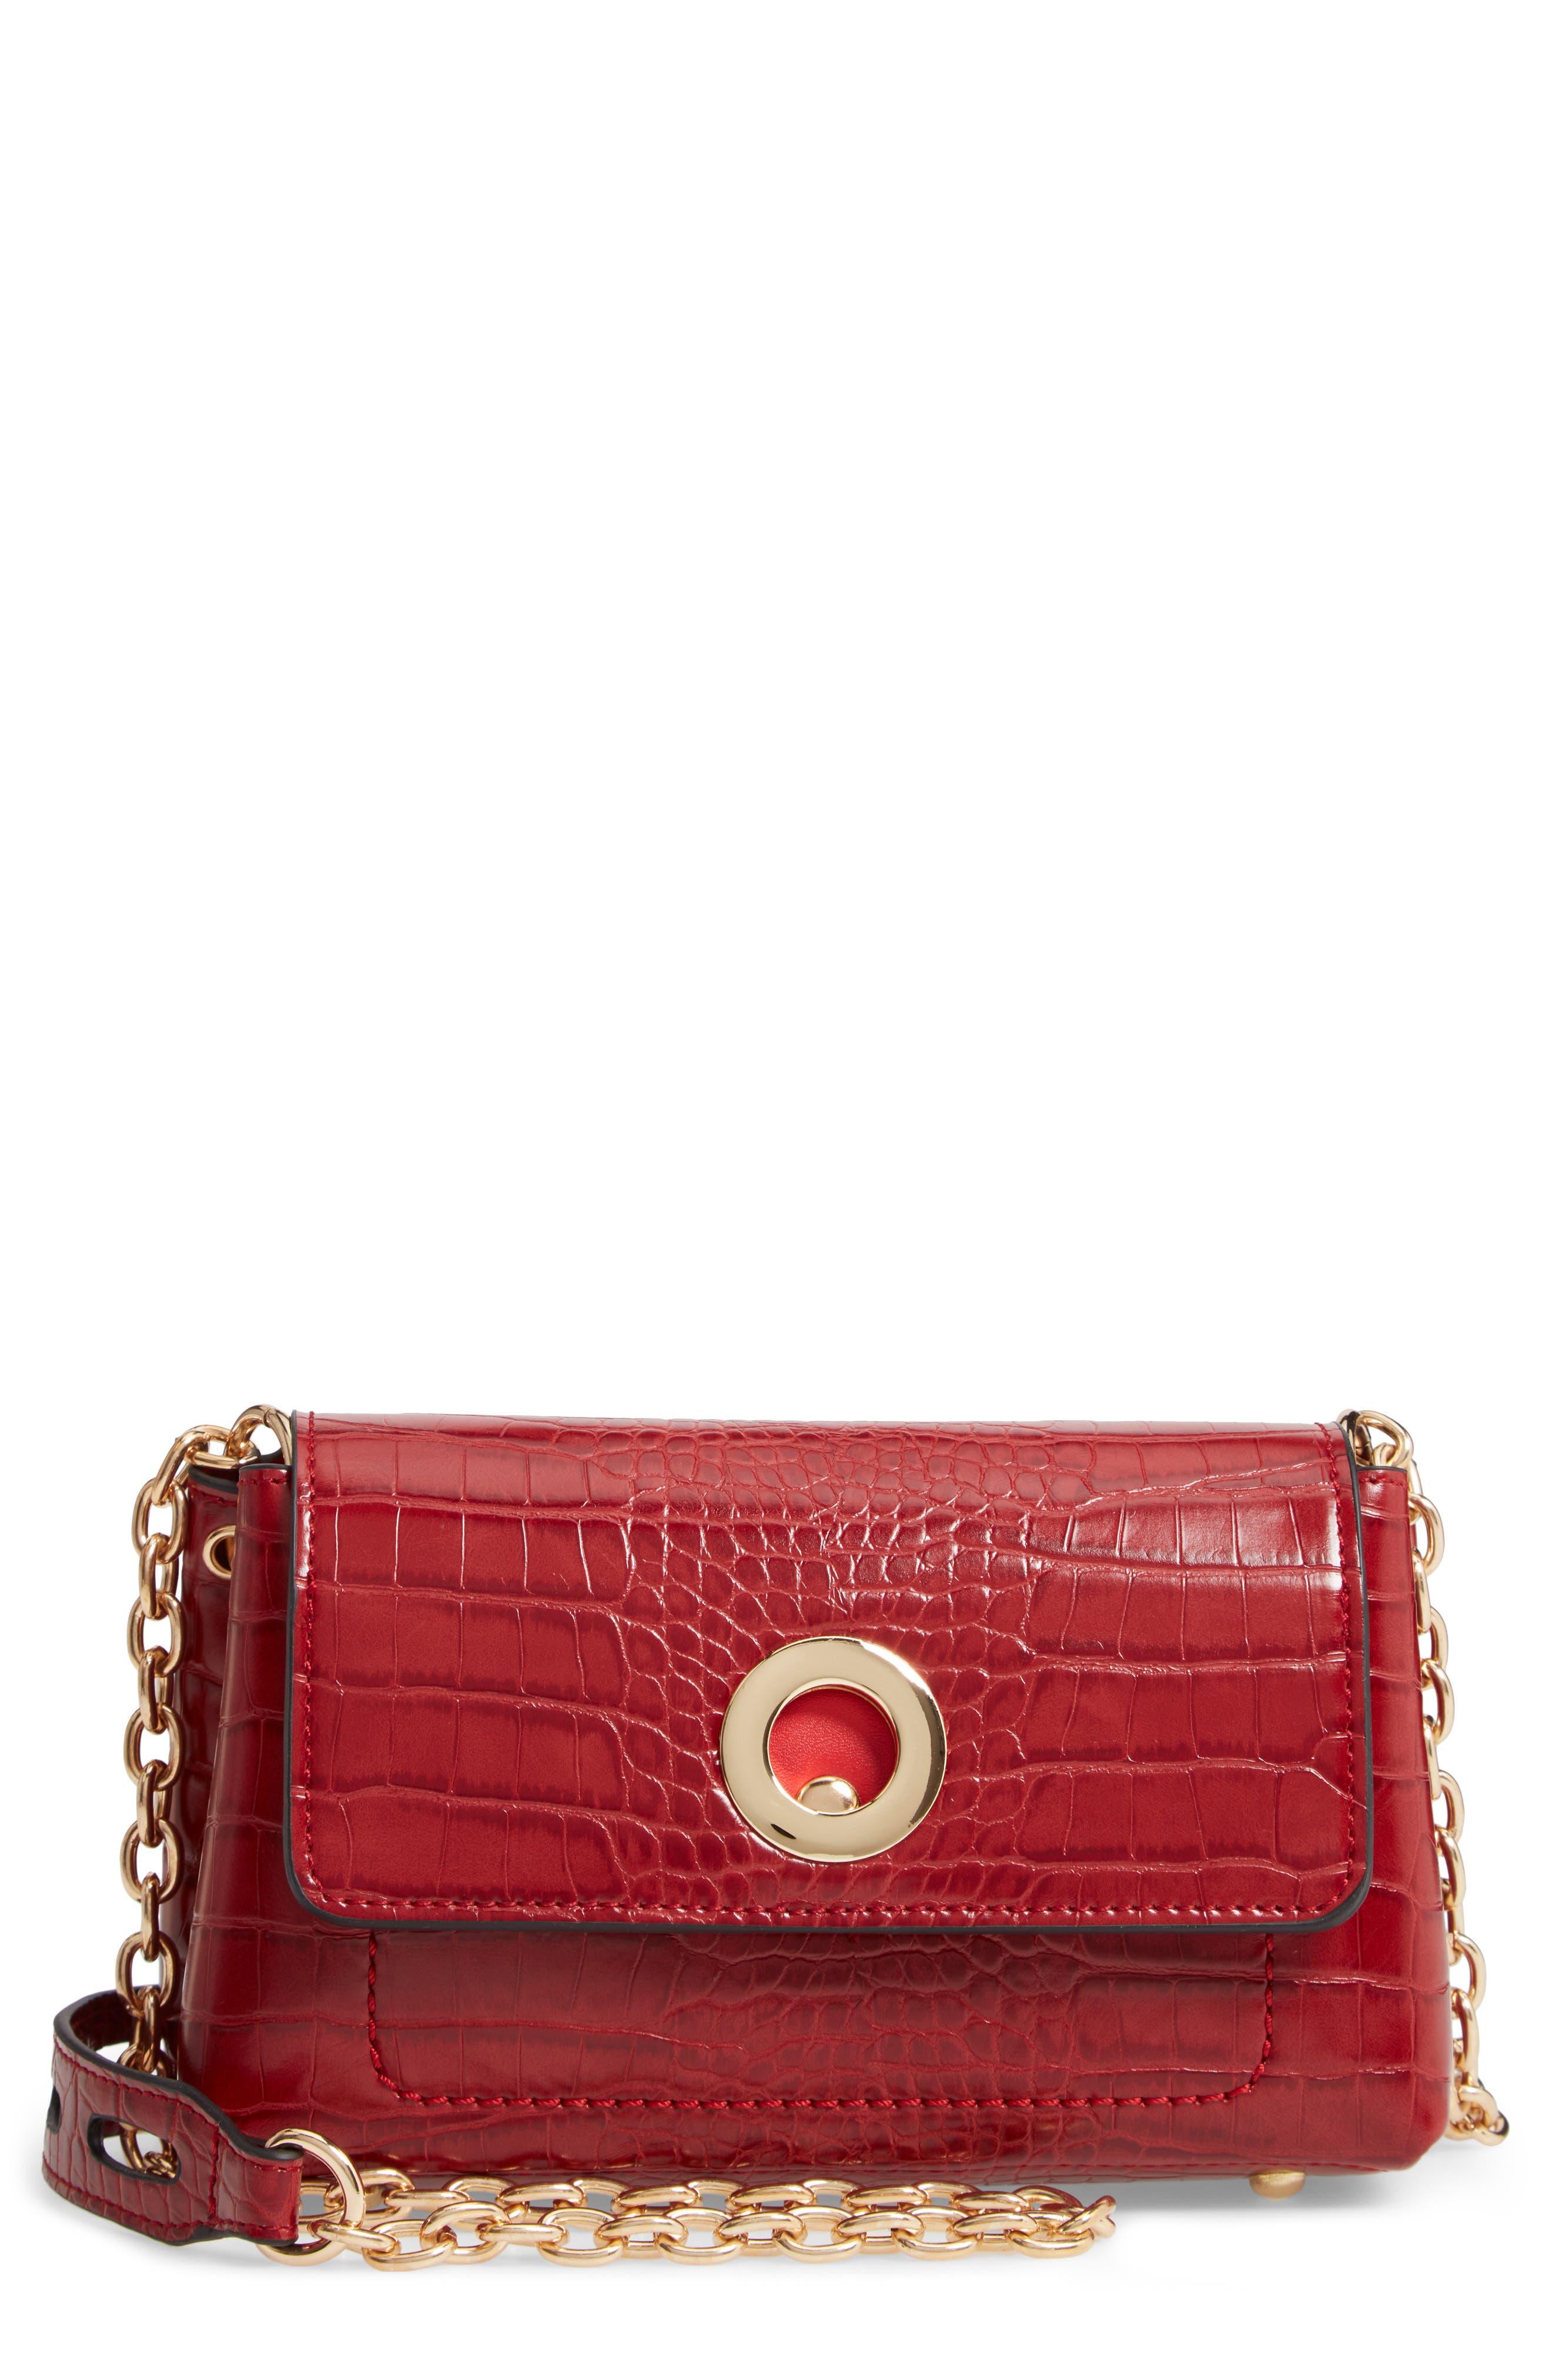 SONDRA ROBERTS Croc Embossed Faux Leather Crossbody Bag - Red